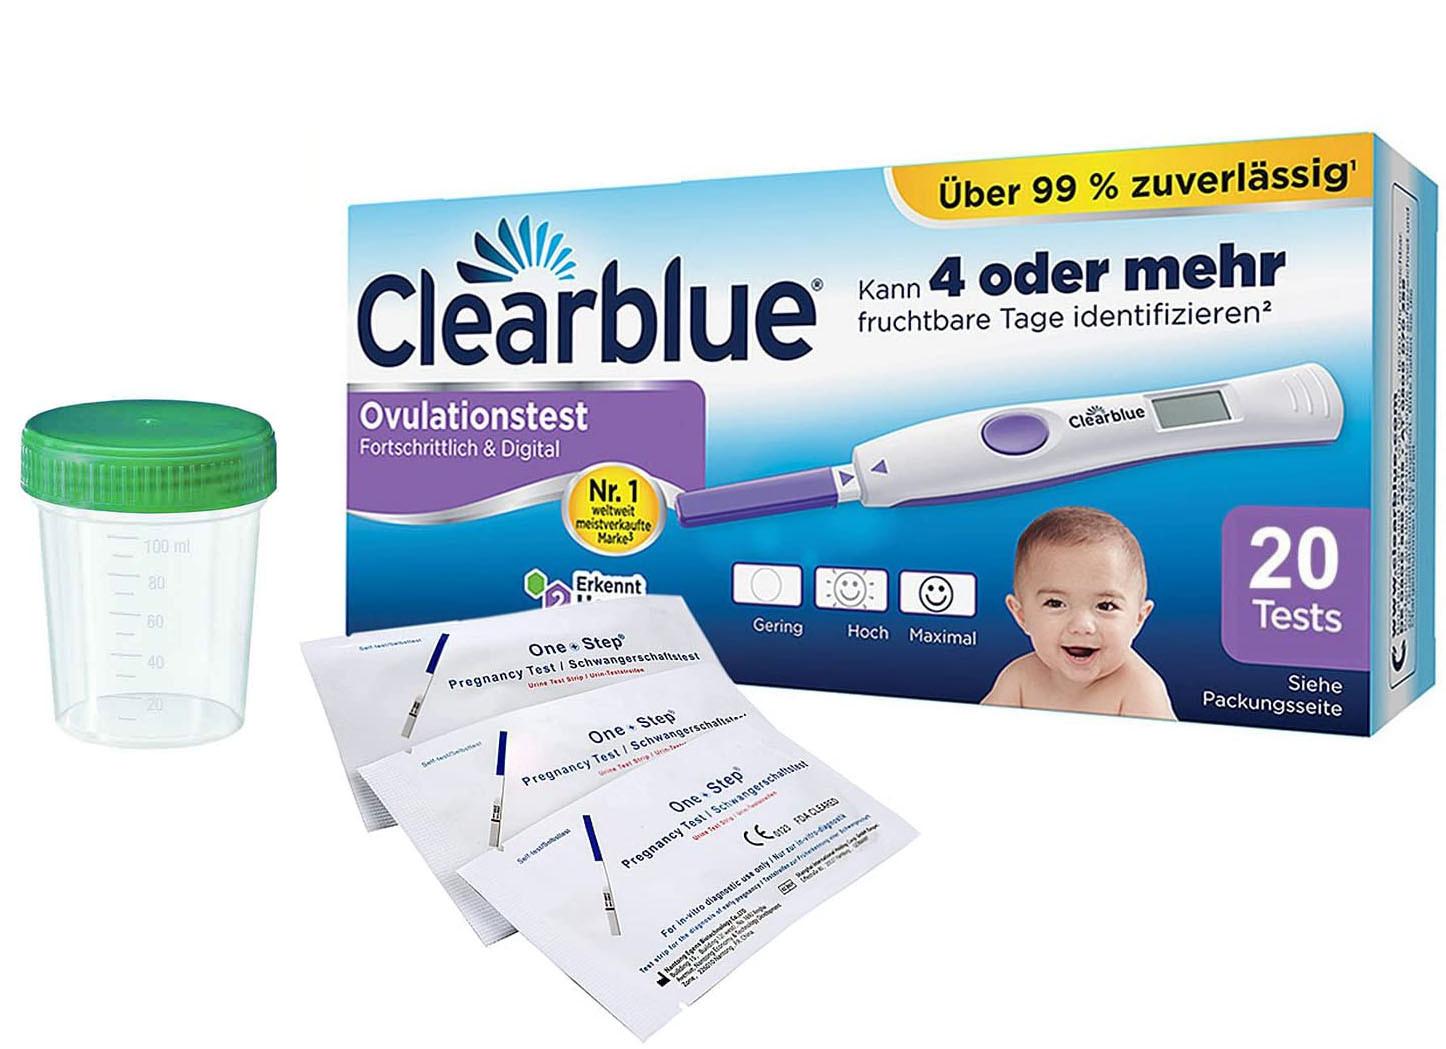 Clearblue Ovulationstest Fortschrittlich & Digital, 20 Tests, 1er Pack (1 x 20 Stück) plus 5 OneStep Schwangerschaftstests 10 miu_ Amazon.de_ Drogerie & Körperpflege_plus_Urinprobenbecher